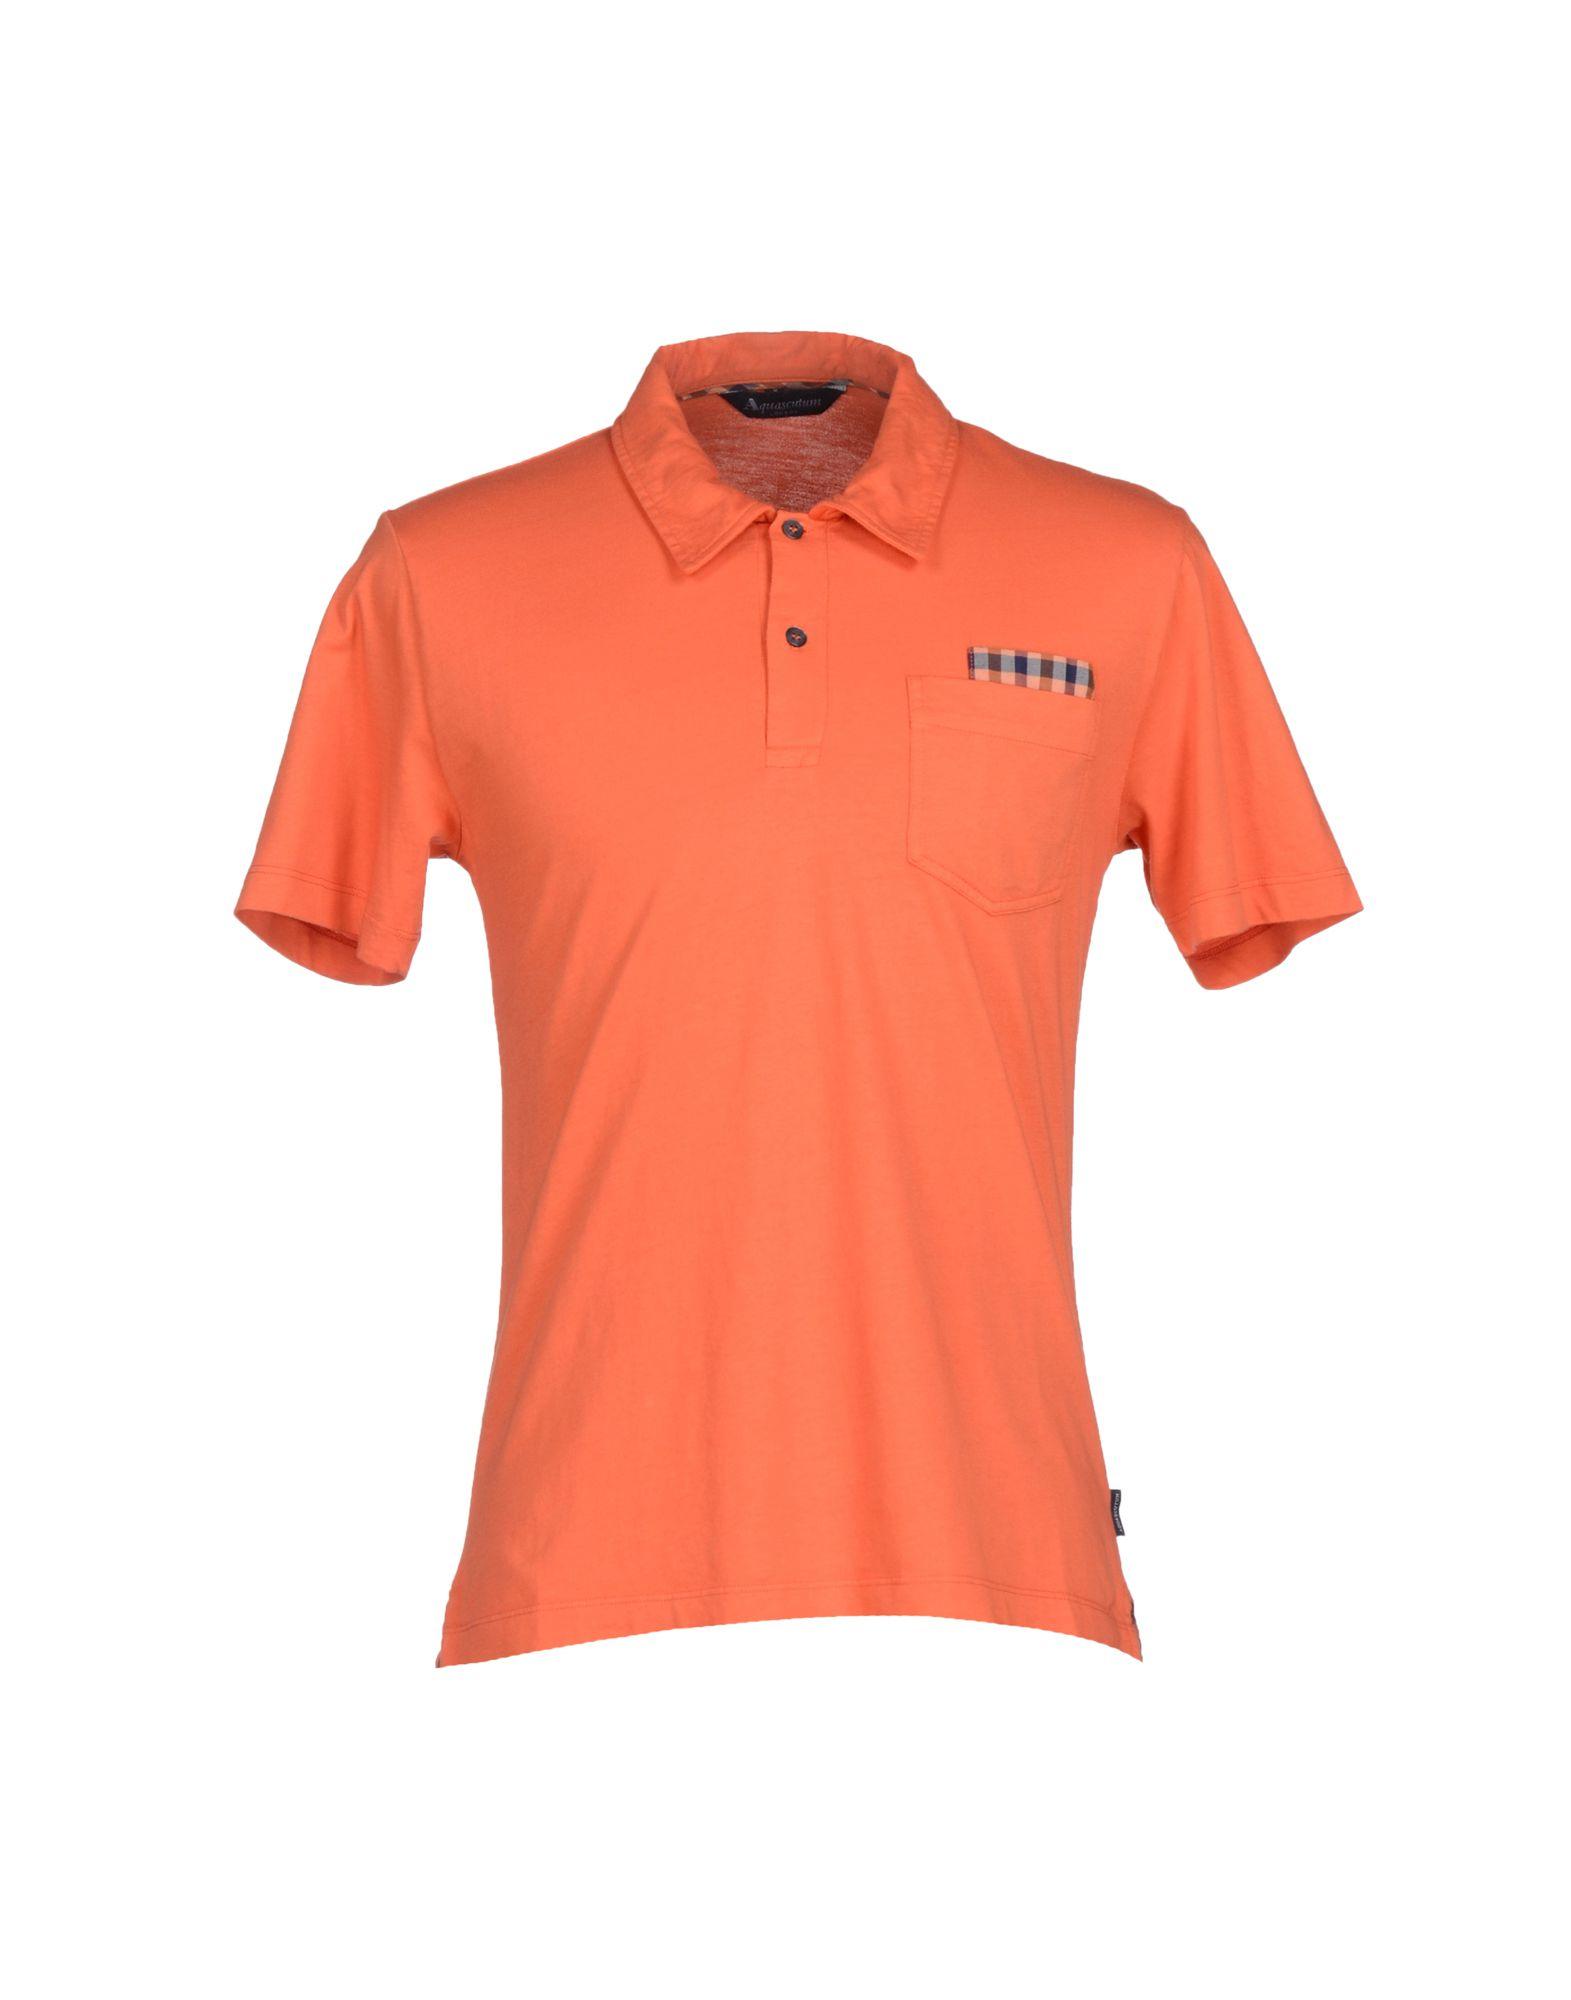 Lyst aquascutum polo shirt in orange for men for Orange polo shirt mens